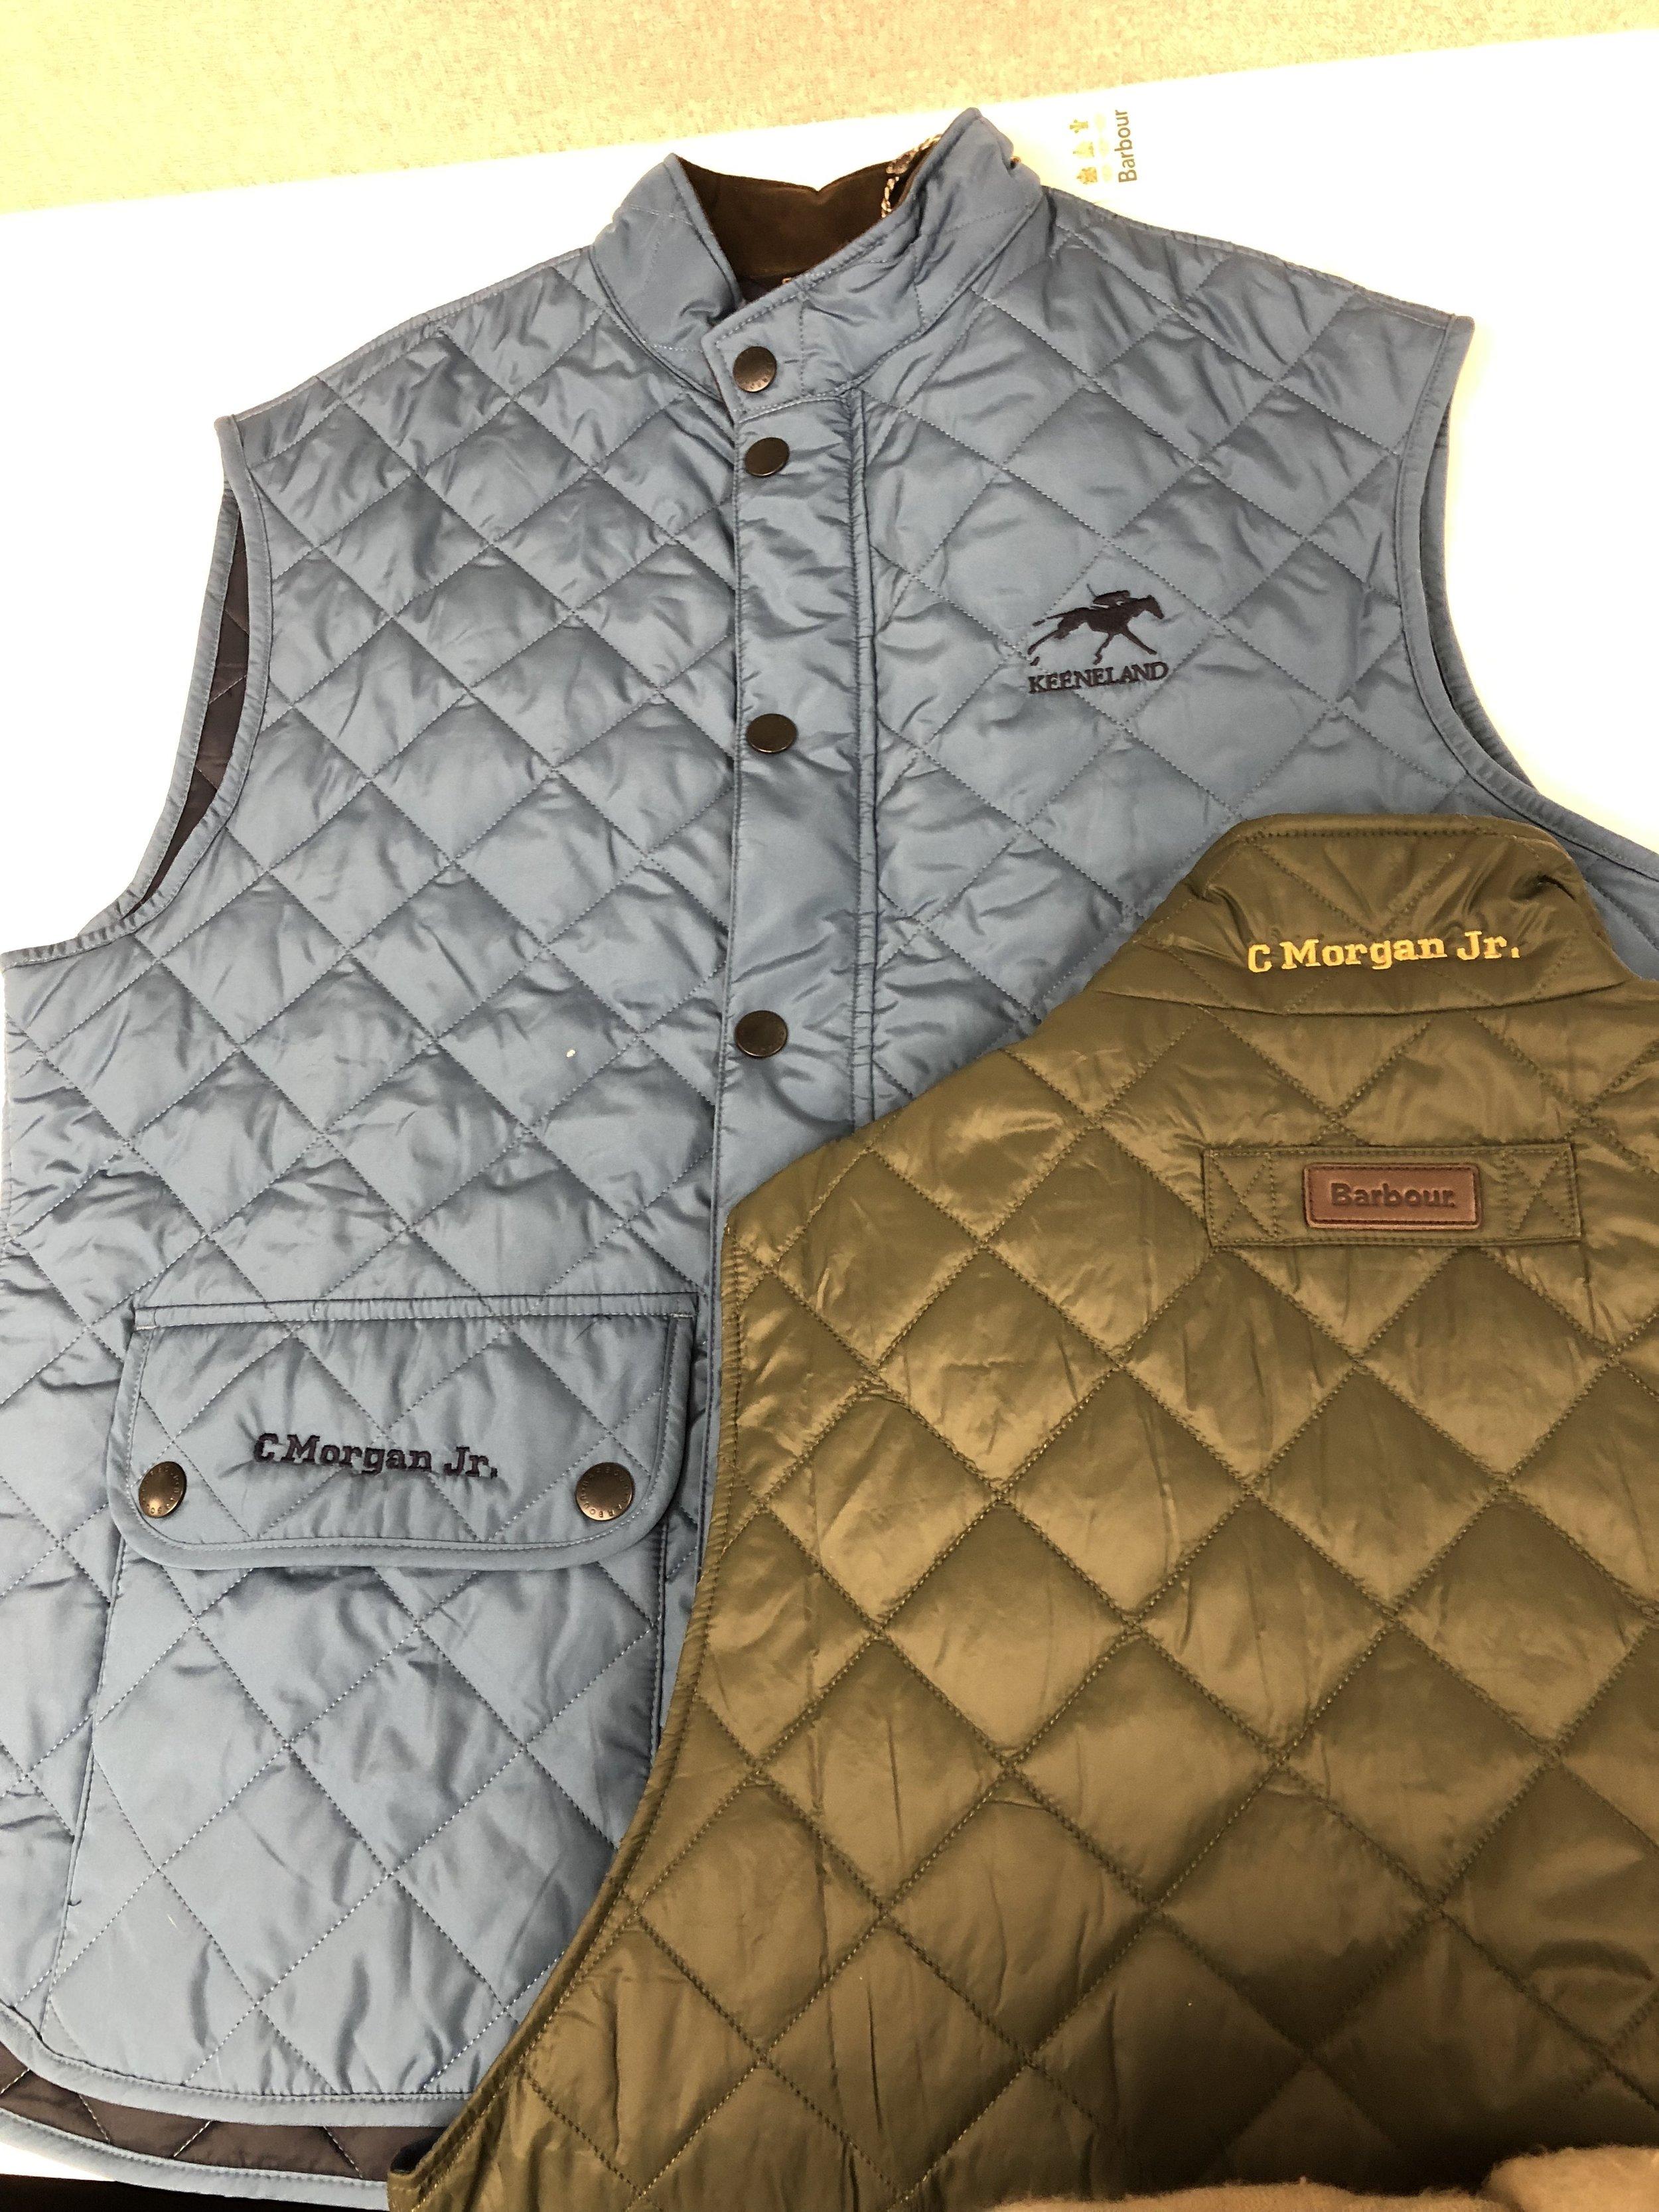 Monogrammed vests for Barbour's Keeneland launch.